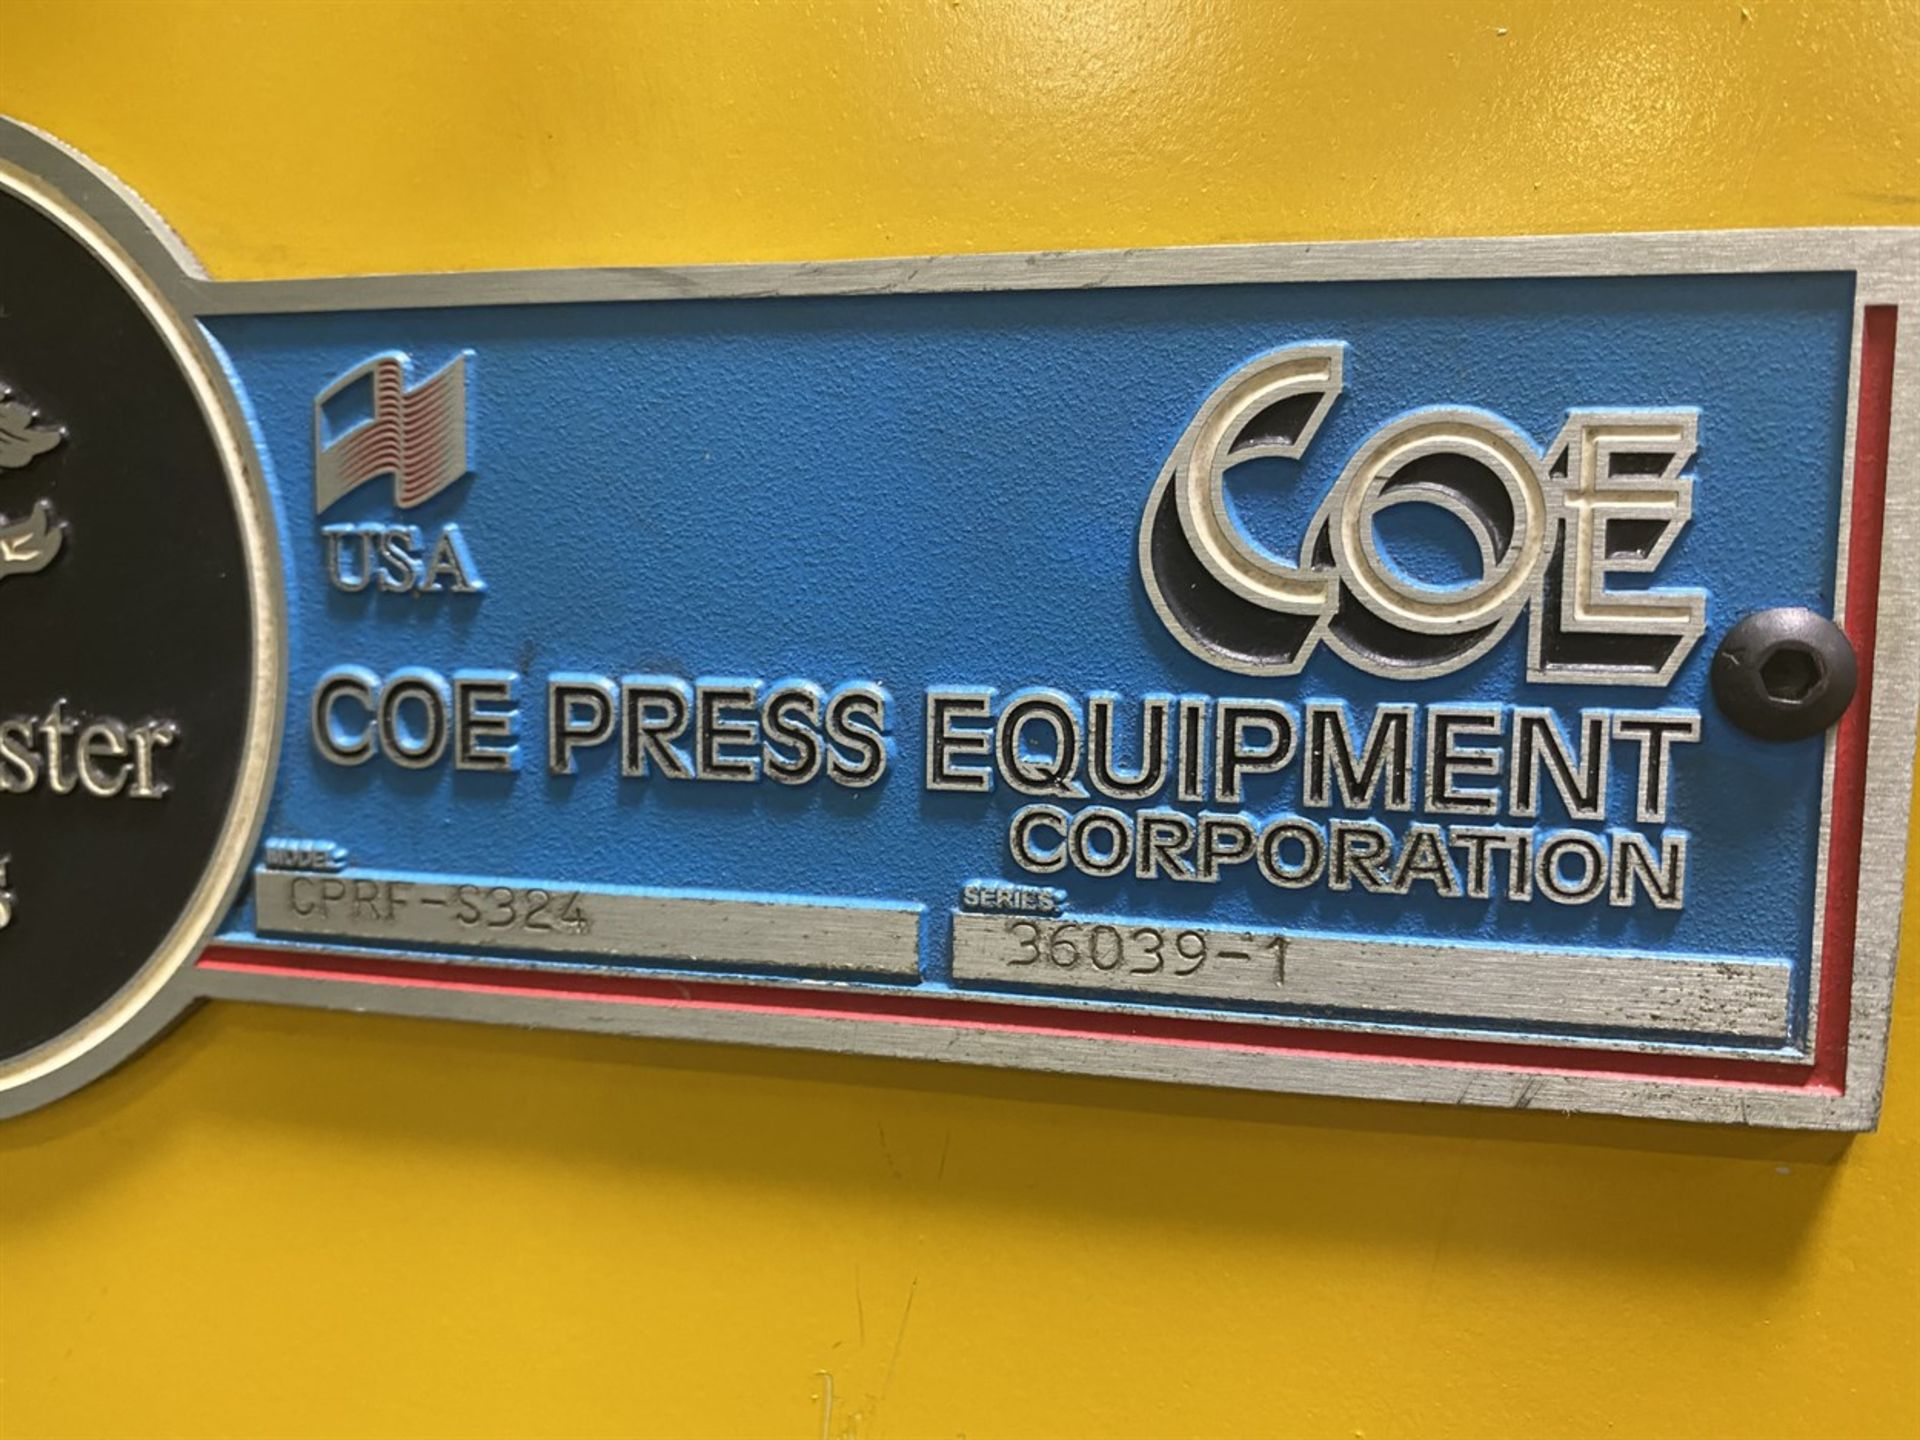 "Lot 55 - COE Coil Line Comprising CPR-PO-10024 Uncoiler w/ Coil Car, s/n 36039-4, 10,000 Lb. Capacity, 24"""